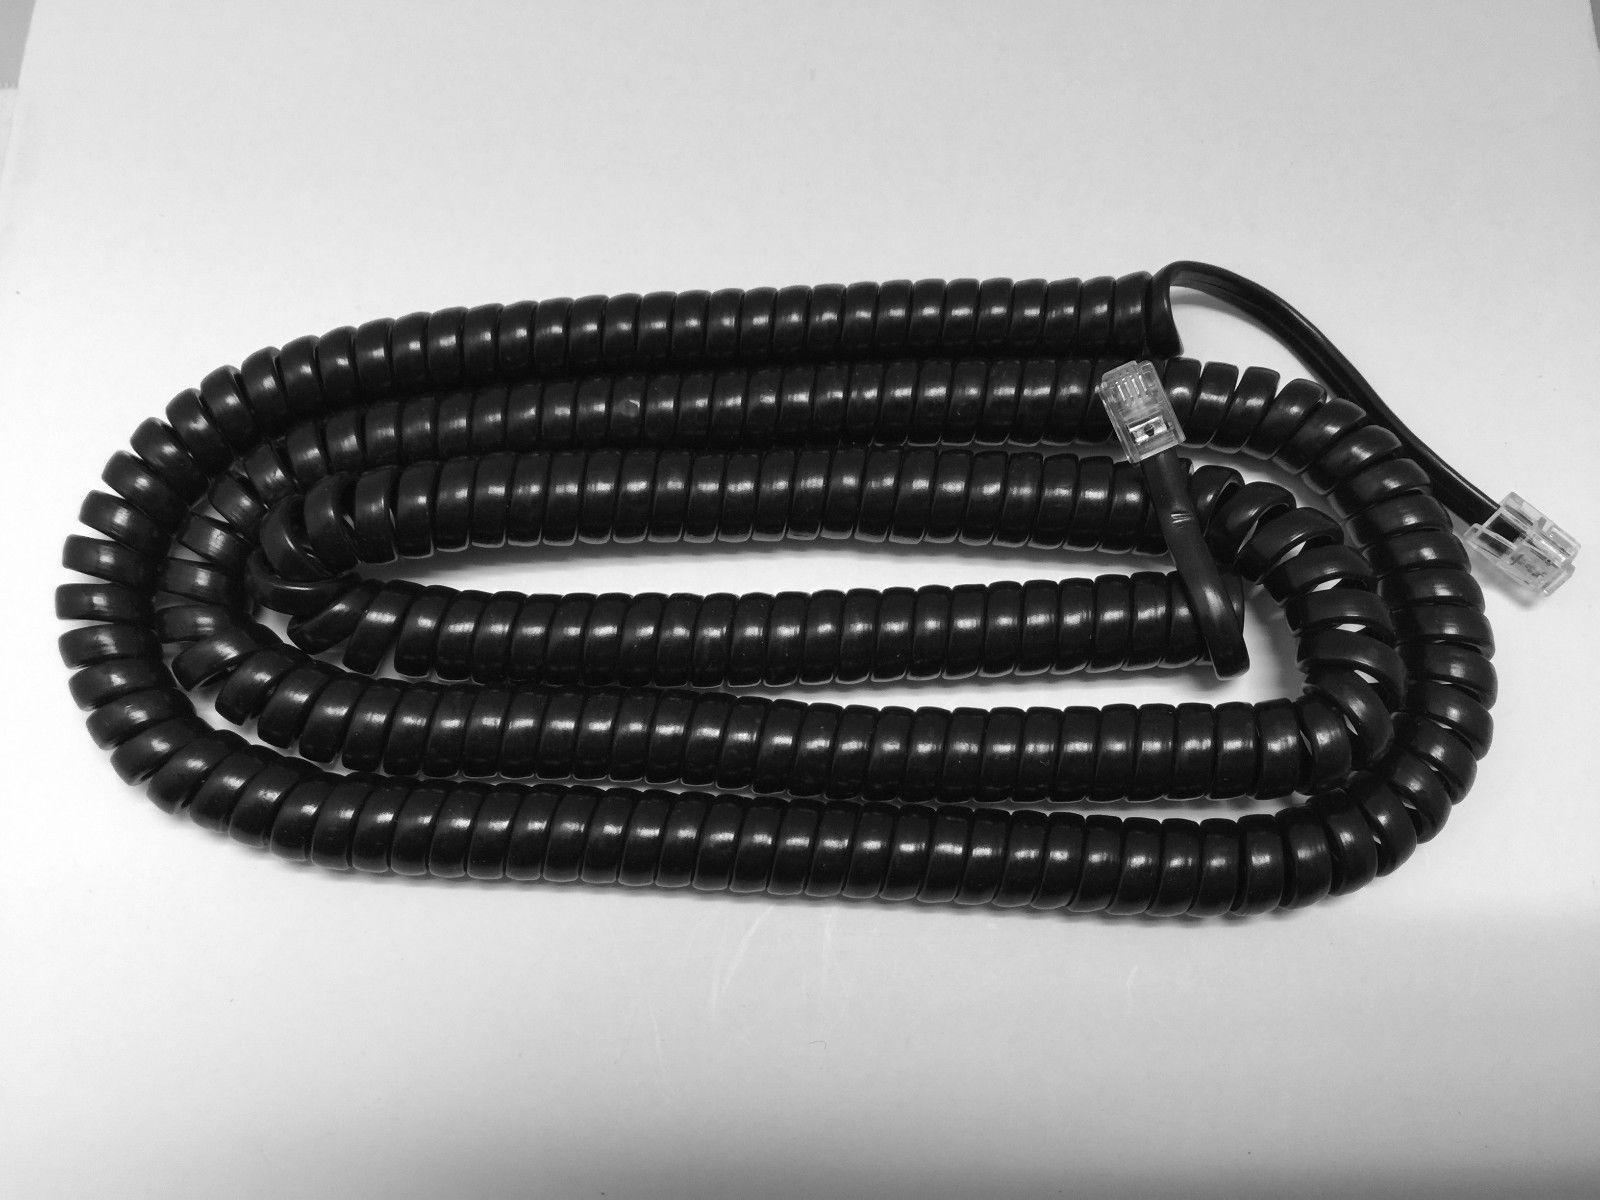 Black 25/' Nortel Norstar Handset Cord M7208 M7310 M7324 M-Series Phone Coil LONG